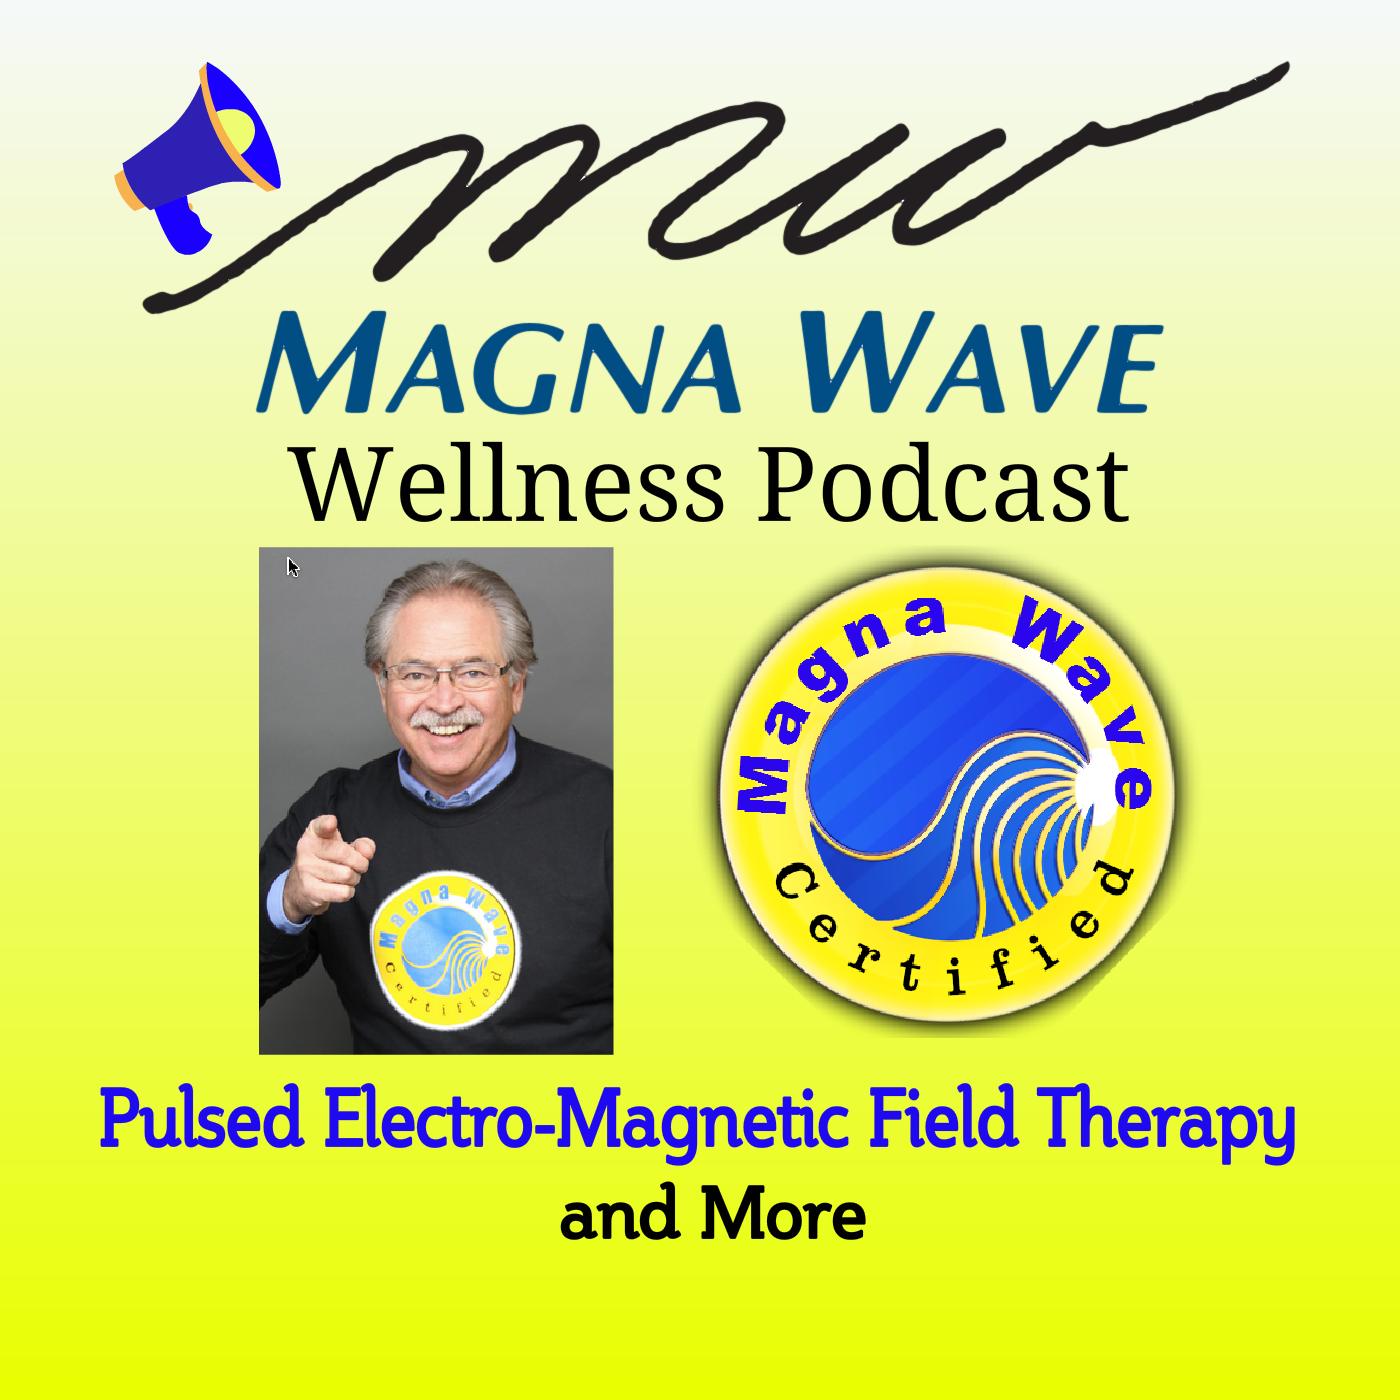 Magna Wave PEMF Wellness Podcast